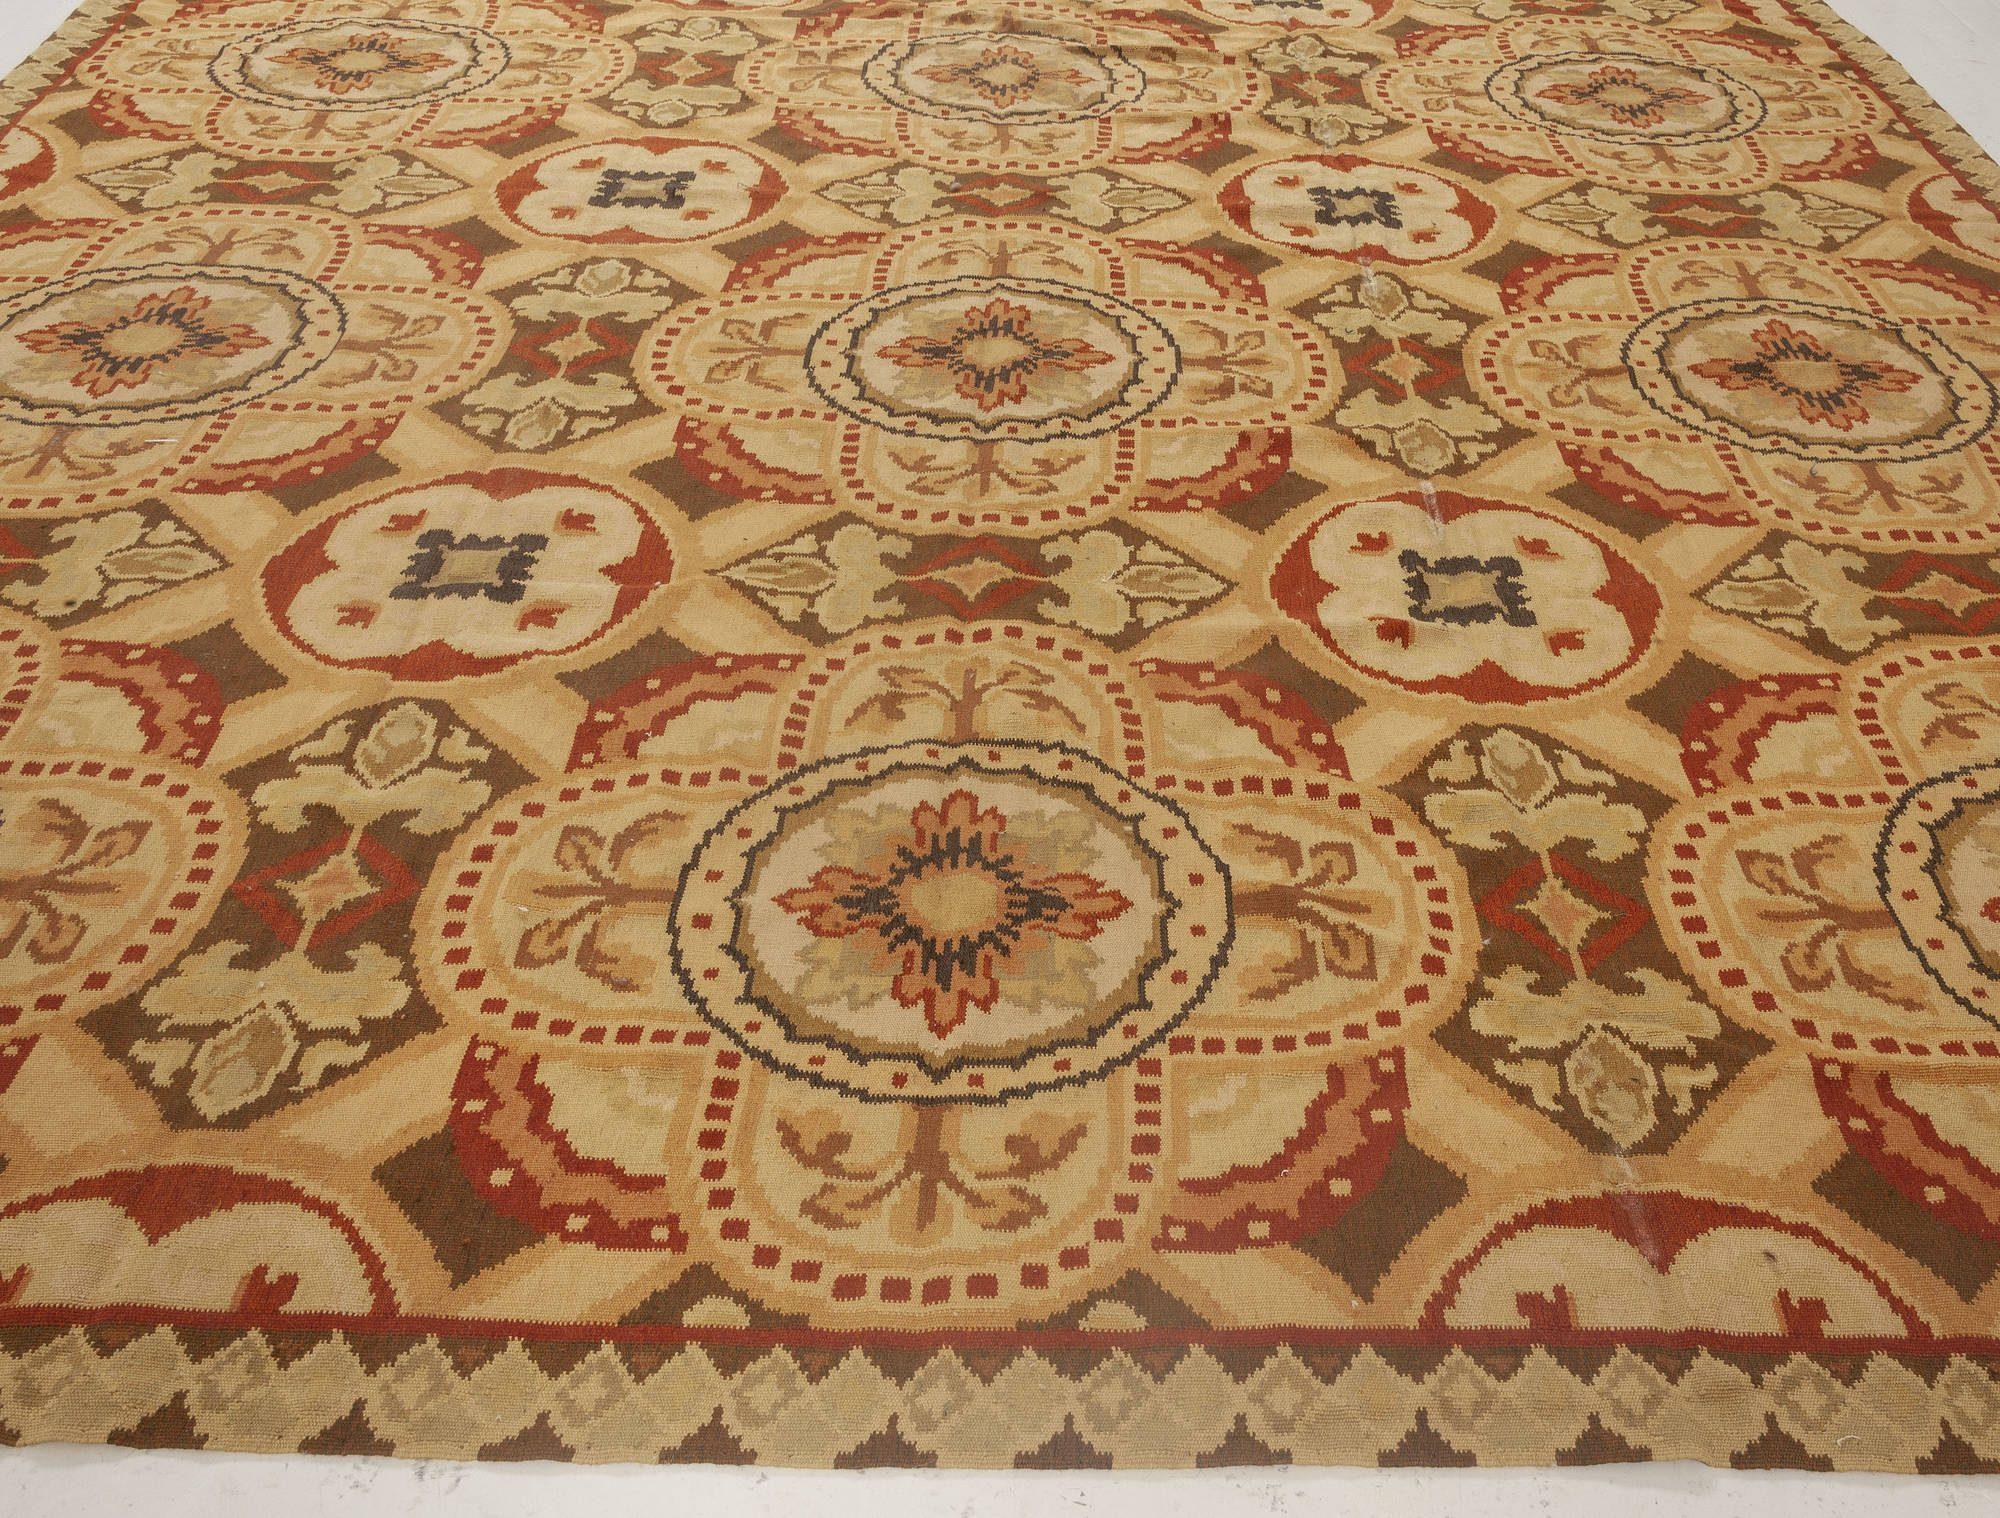 Bessarabian Inspired Design Black, Brown, Red & White Wool Rug N11883